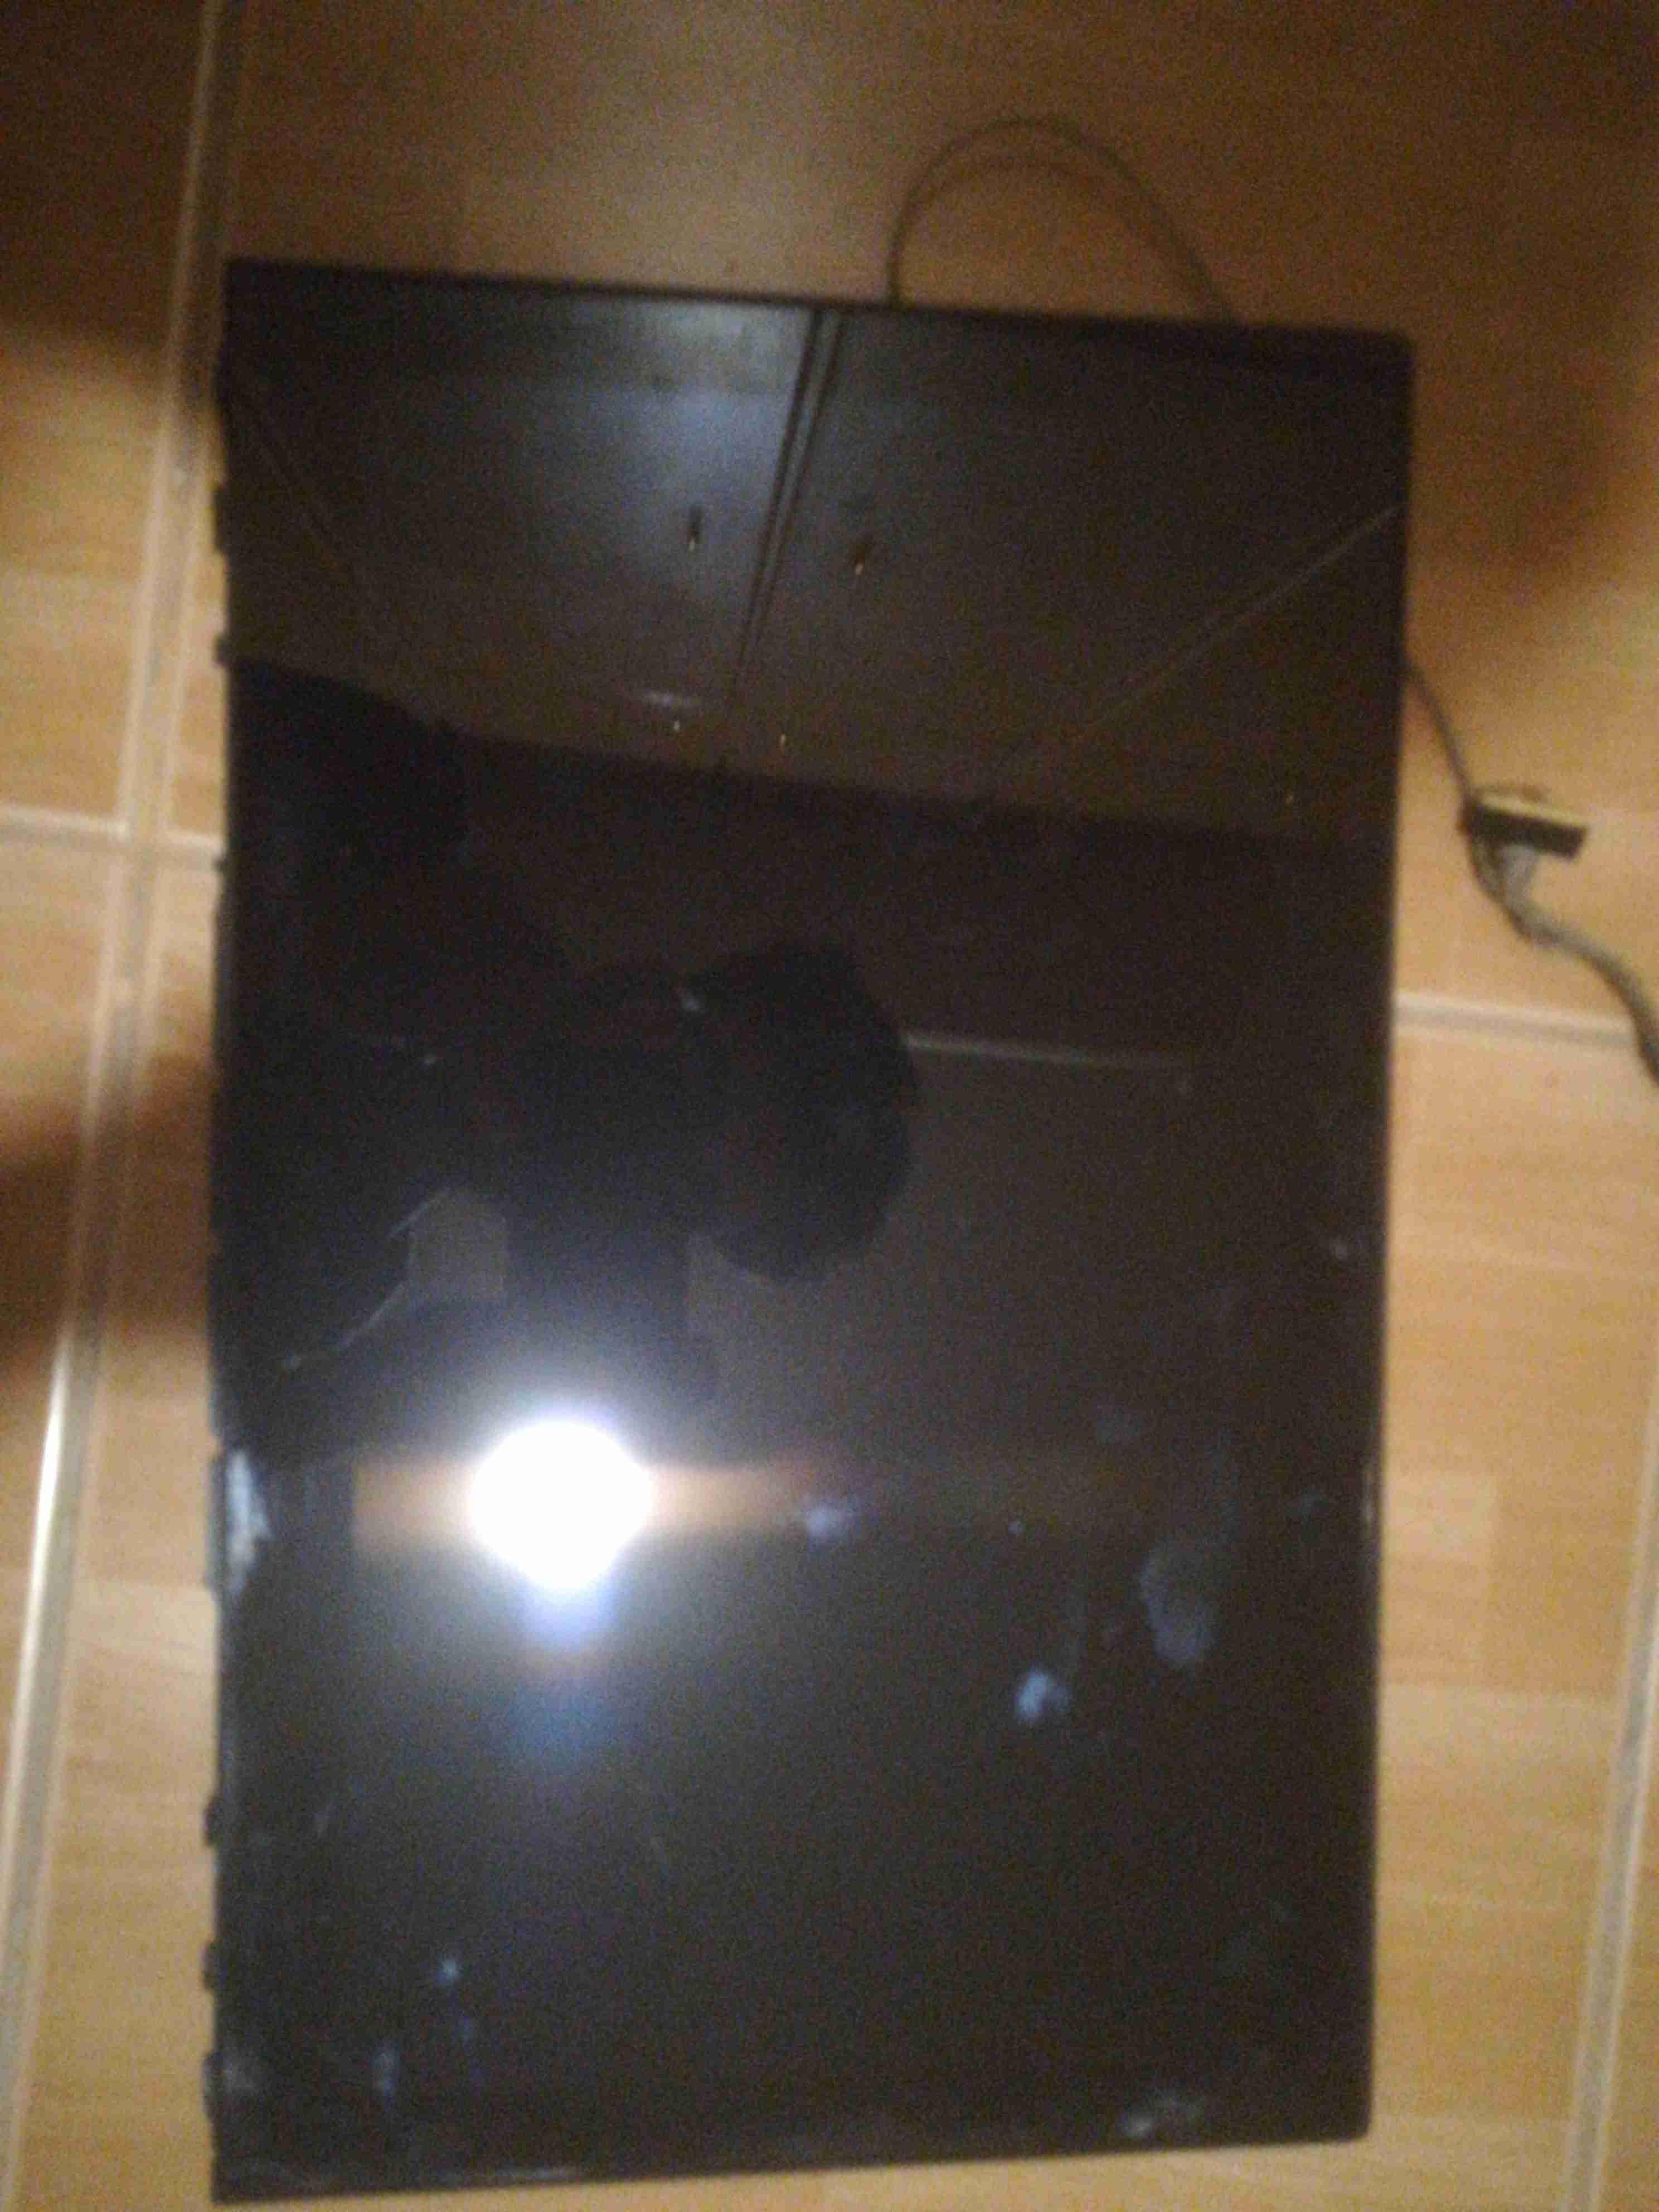 ASUS Transformer Book T100 detachable laptop 2in1 windows 10 like new-  شاشه لينوفو لا تنسَ أنك...